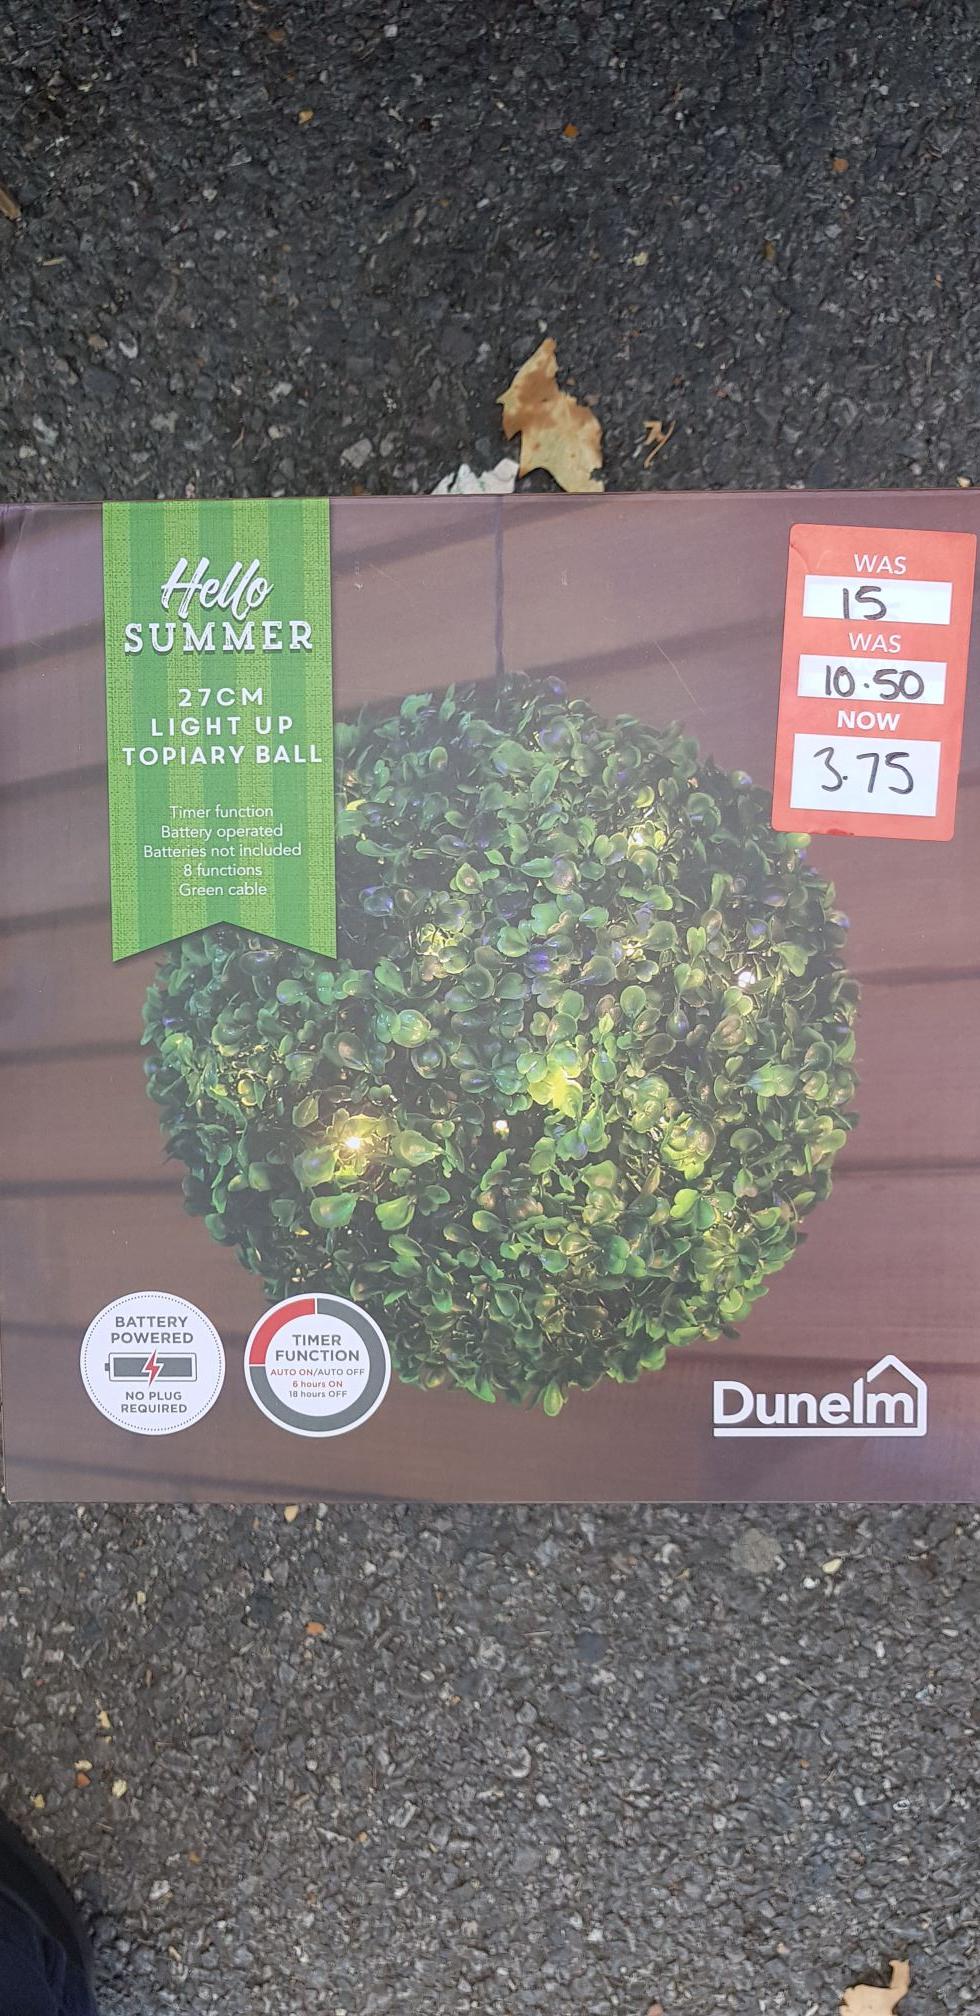 Light Up Artificial Topiary Ball £3.75 Dunelm - c&c